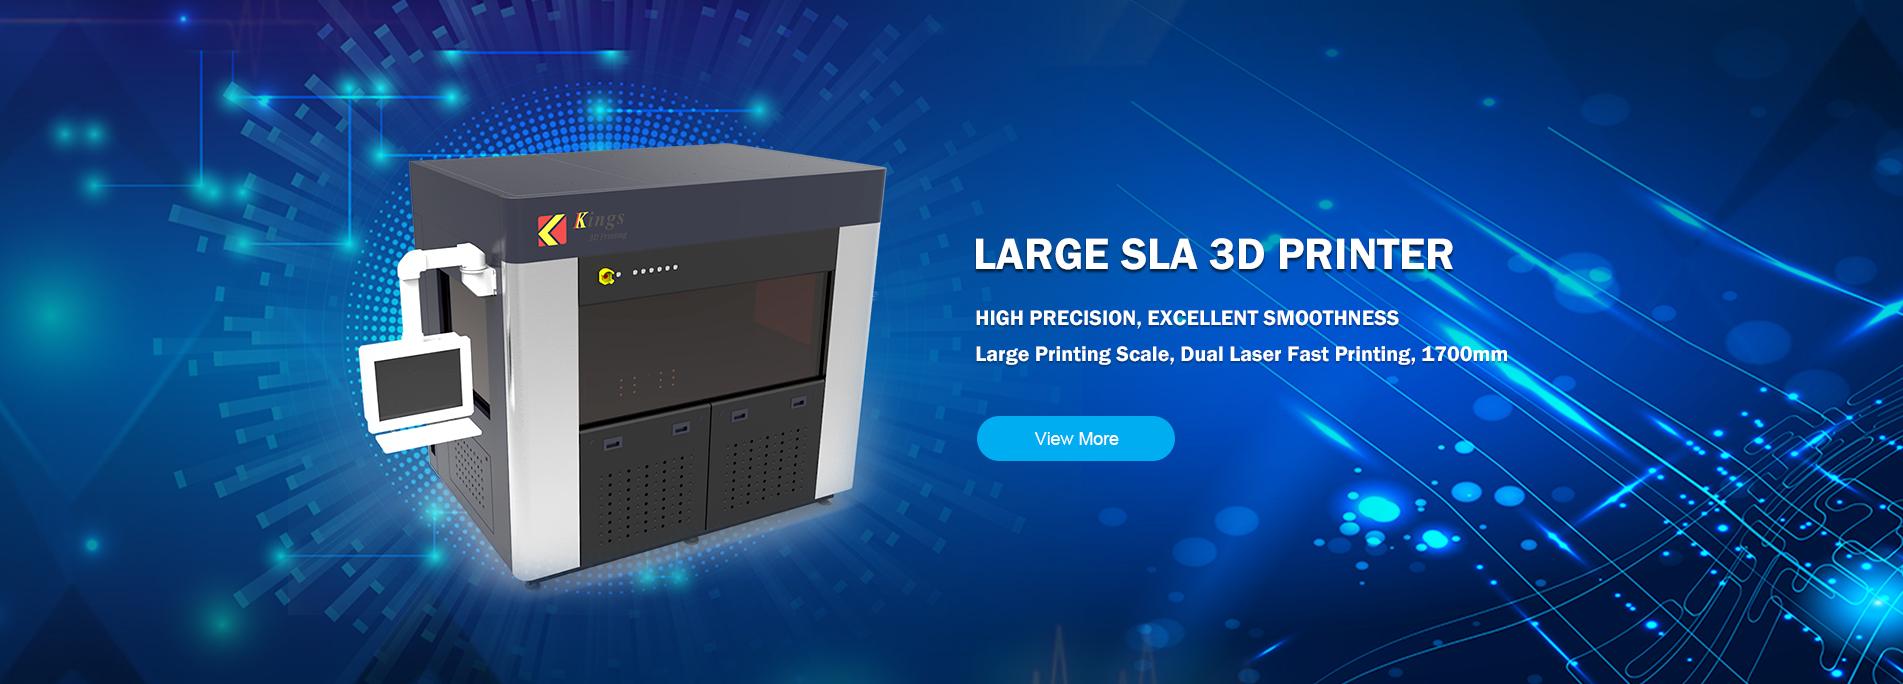 Shenzhen Kings 3D Printing Technology Co., Ltd.